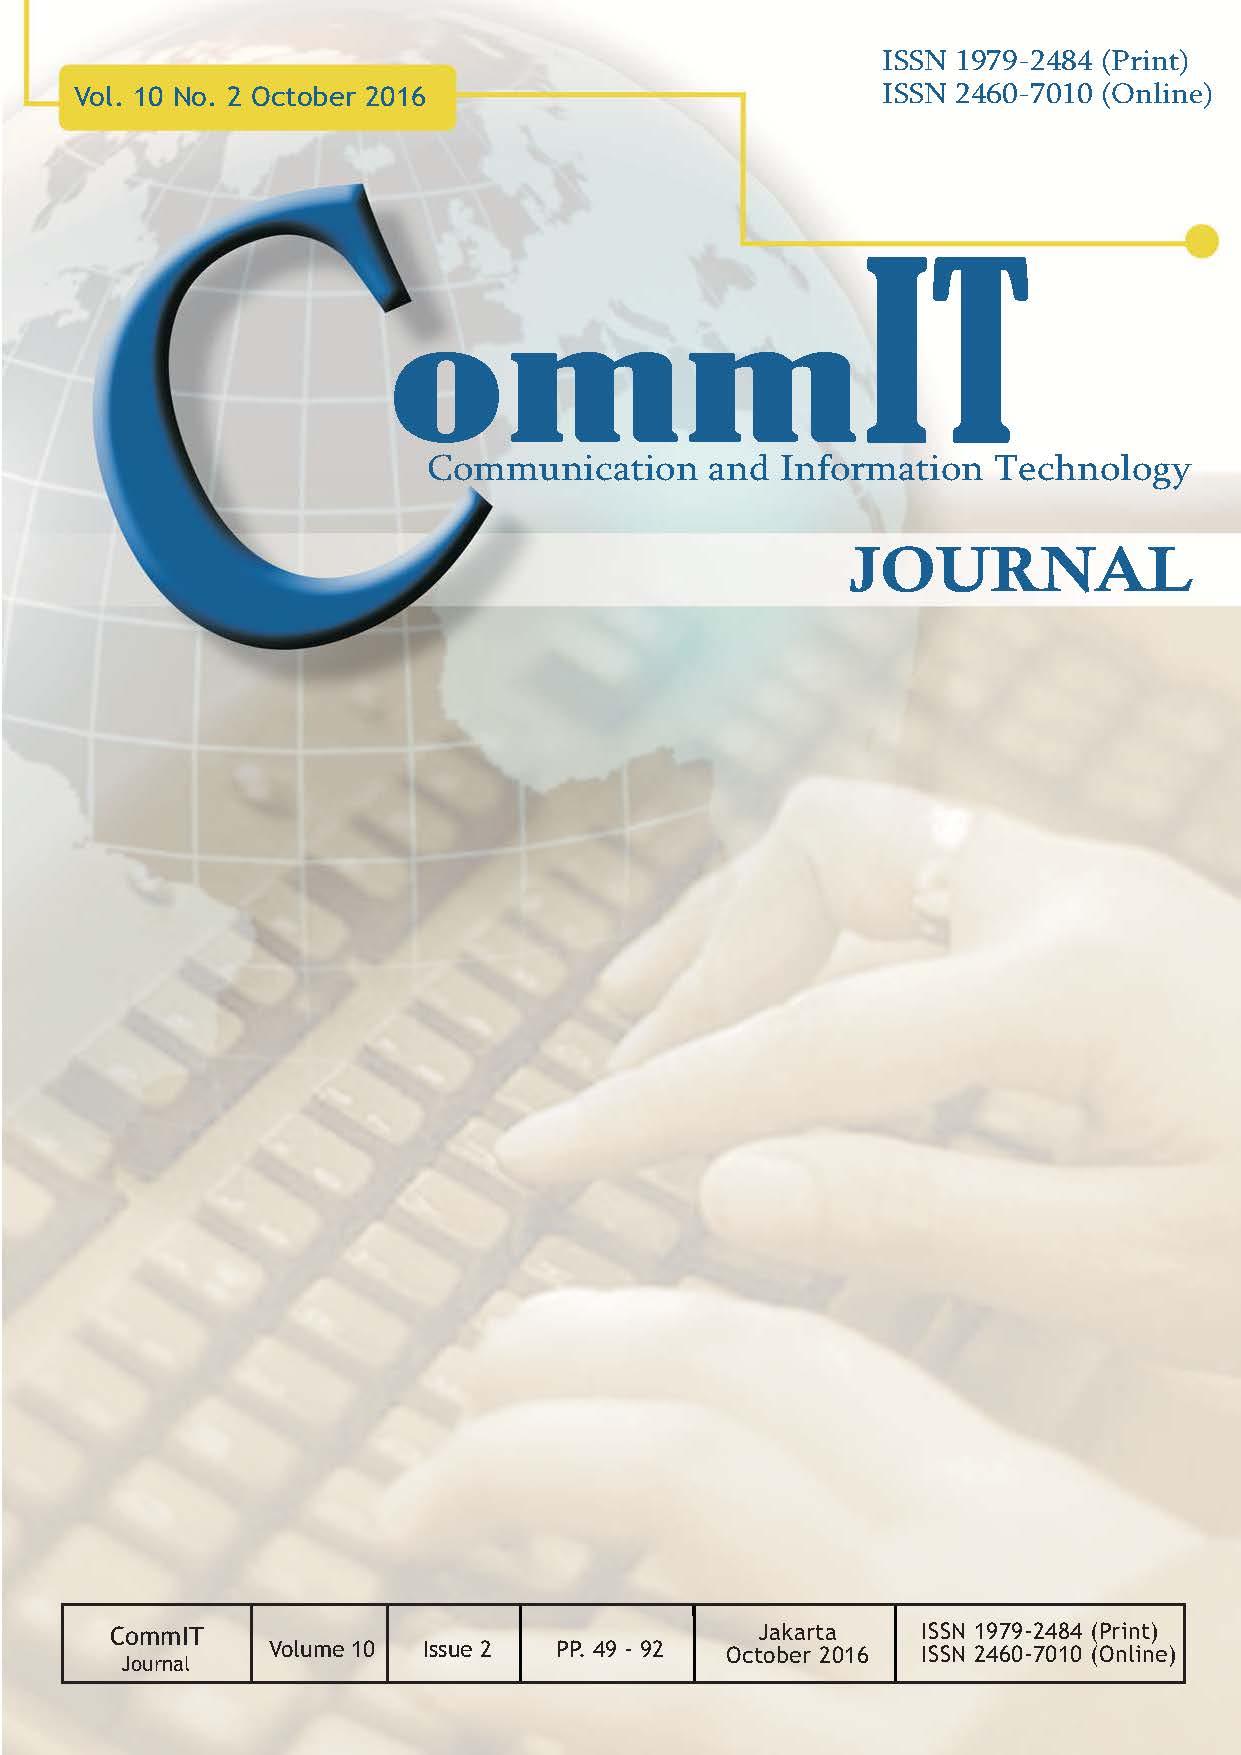 View Vol. 10 No. 2 (2016): CommIT Journal